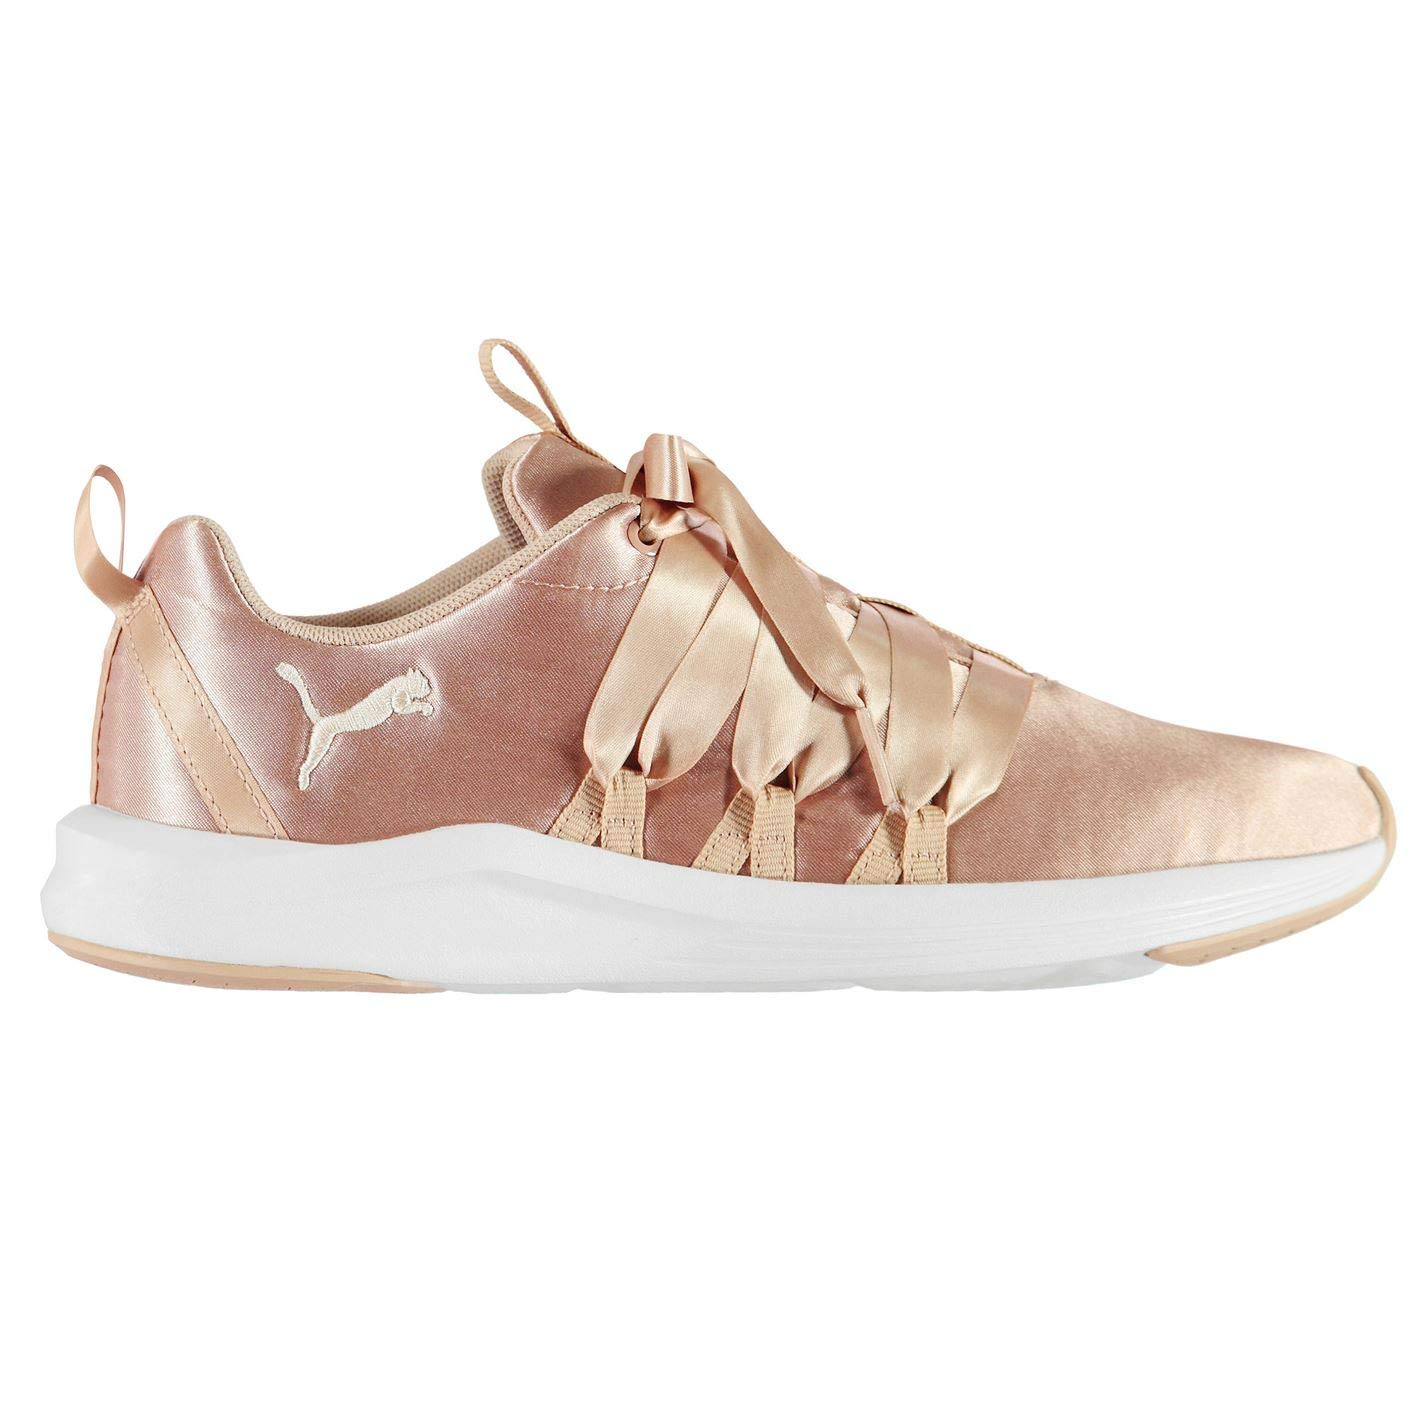 c8e95b1e Puma Women's Prowl Alt Satin WN's Peach Beige White Running Shoes ...